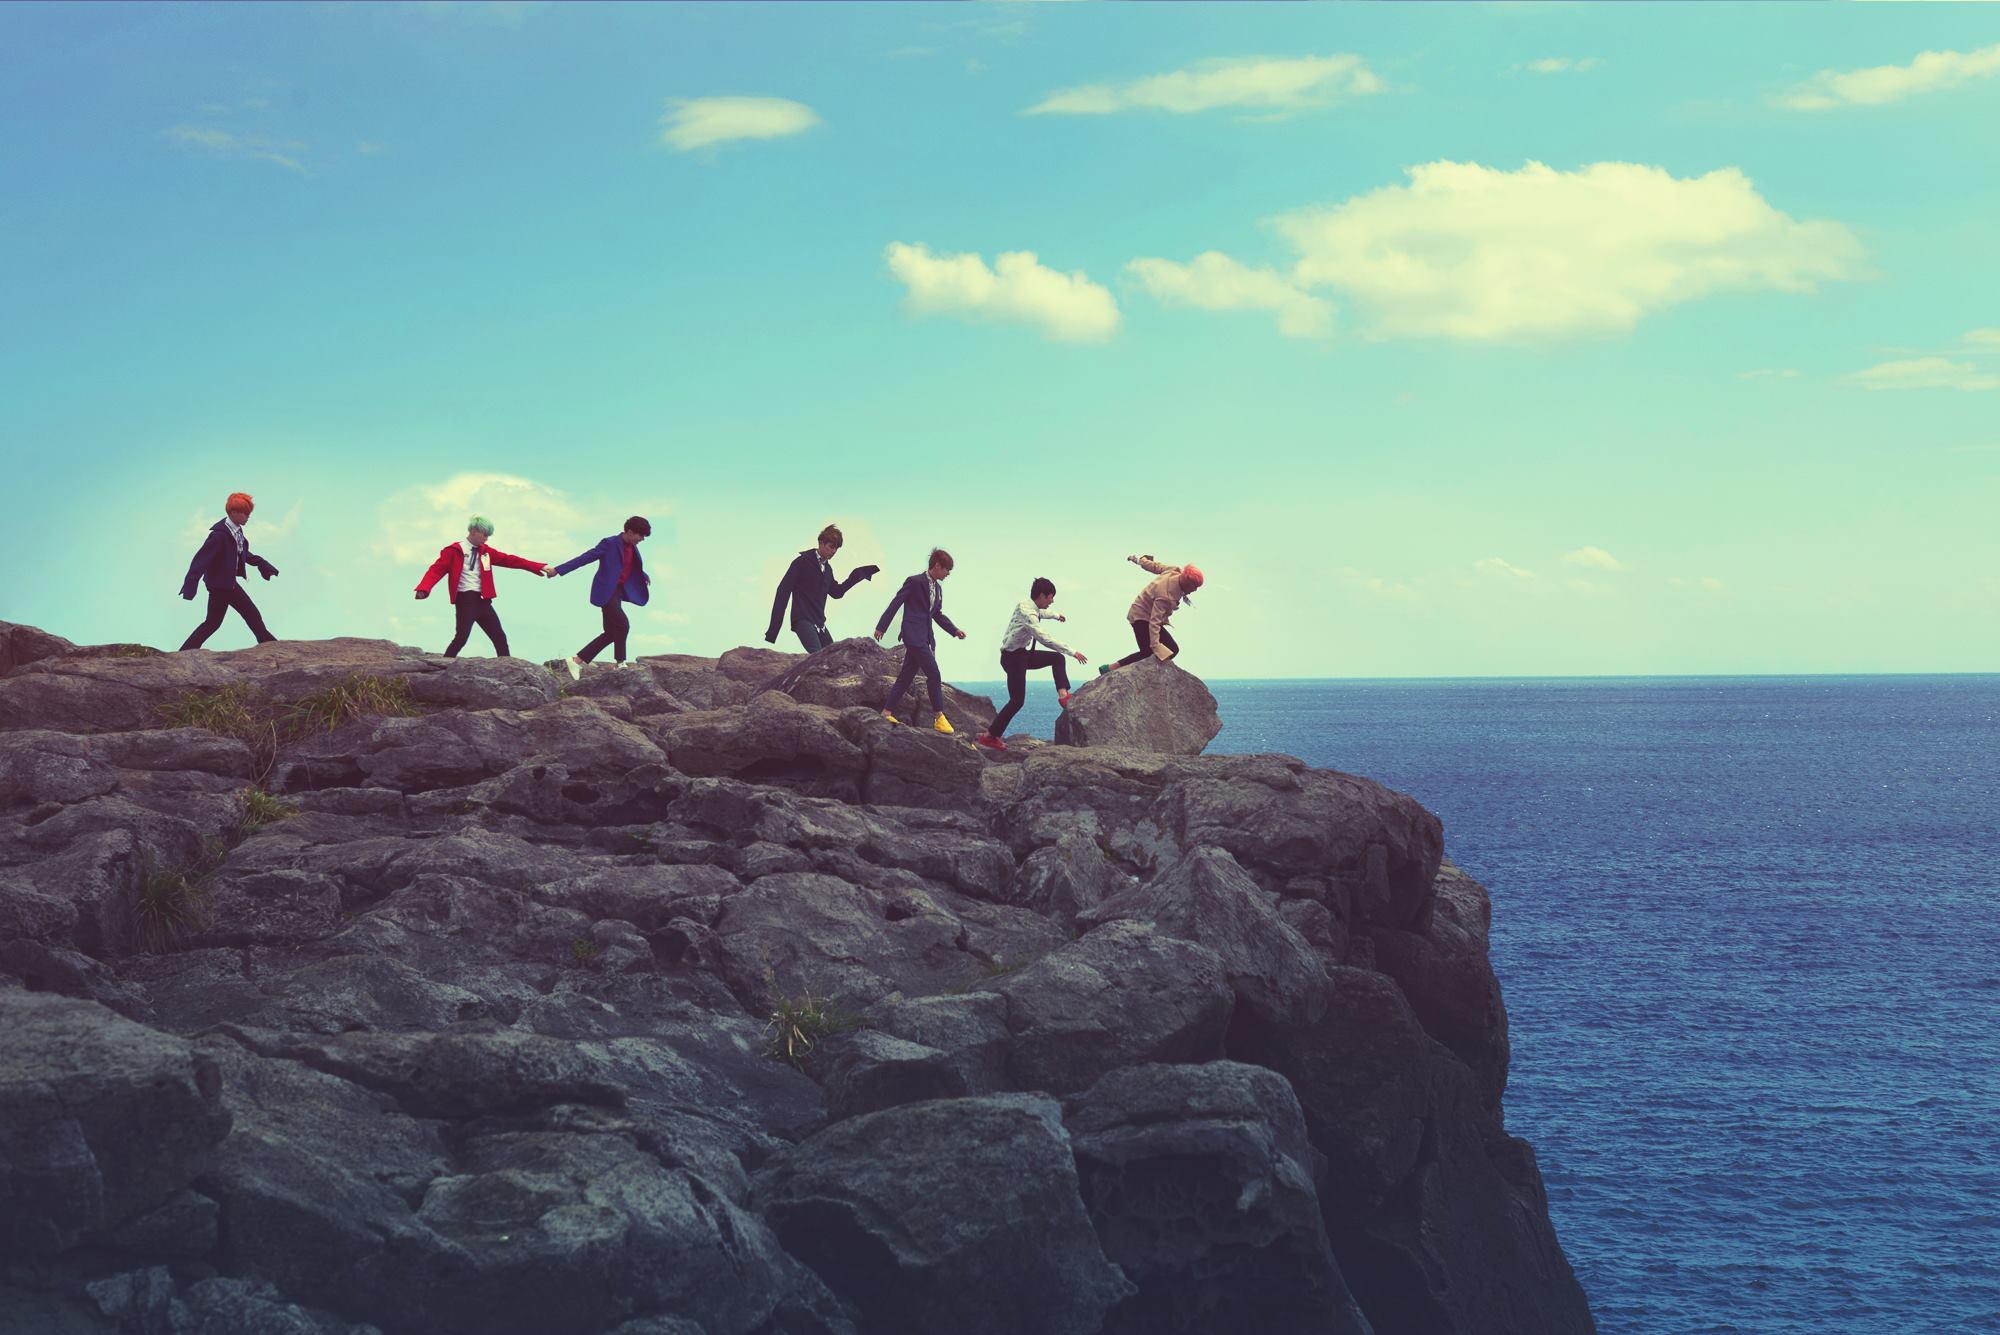 4.BTS - Intro : 화양연화 花漾年華 他們不只照片很有感覺,歌詞也很有感覺啊!